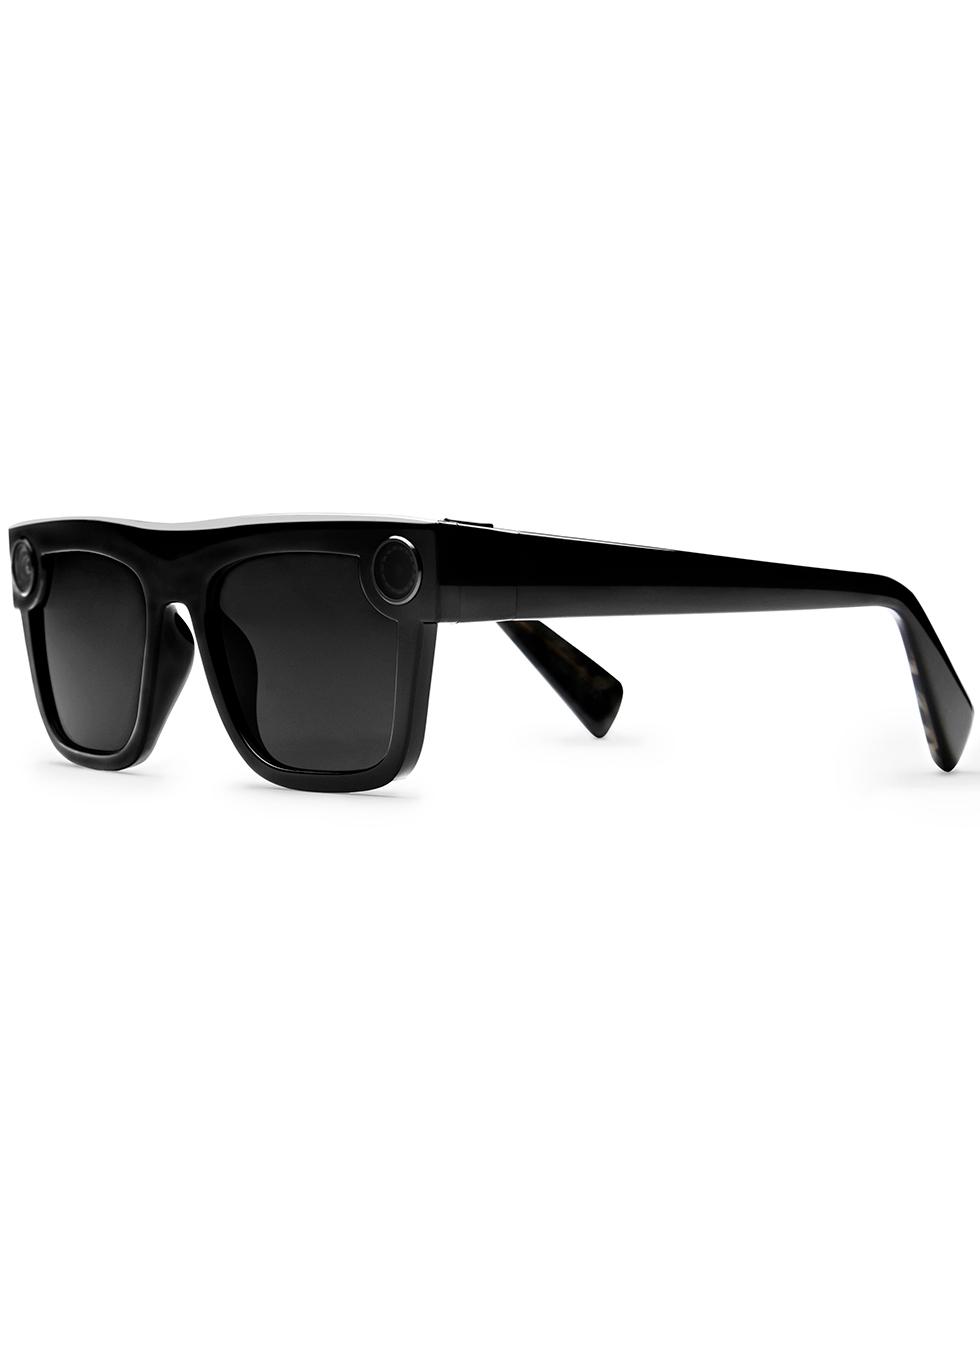 a135cbd5932a Mens designer sunglasses eyewear harvey nichols jpg 980x1372 Celine mens  sunglasses